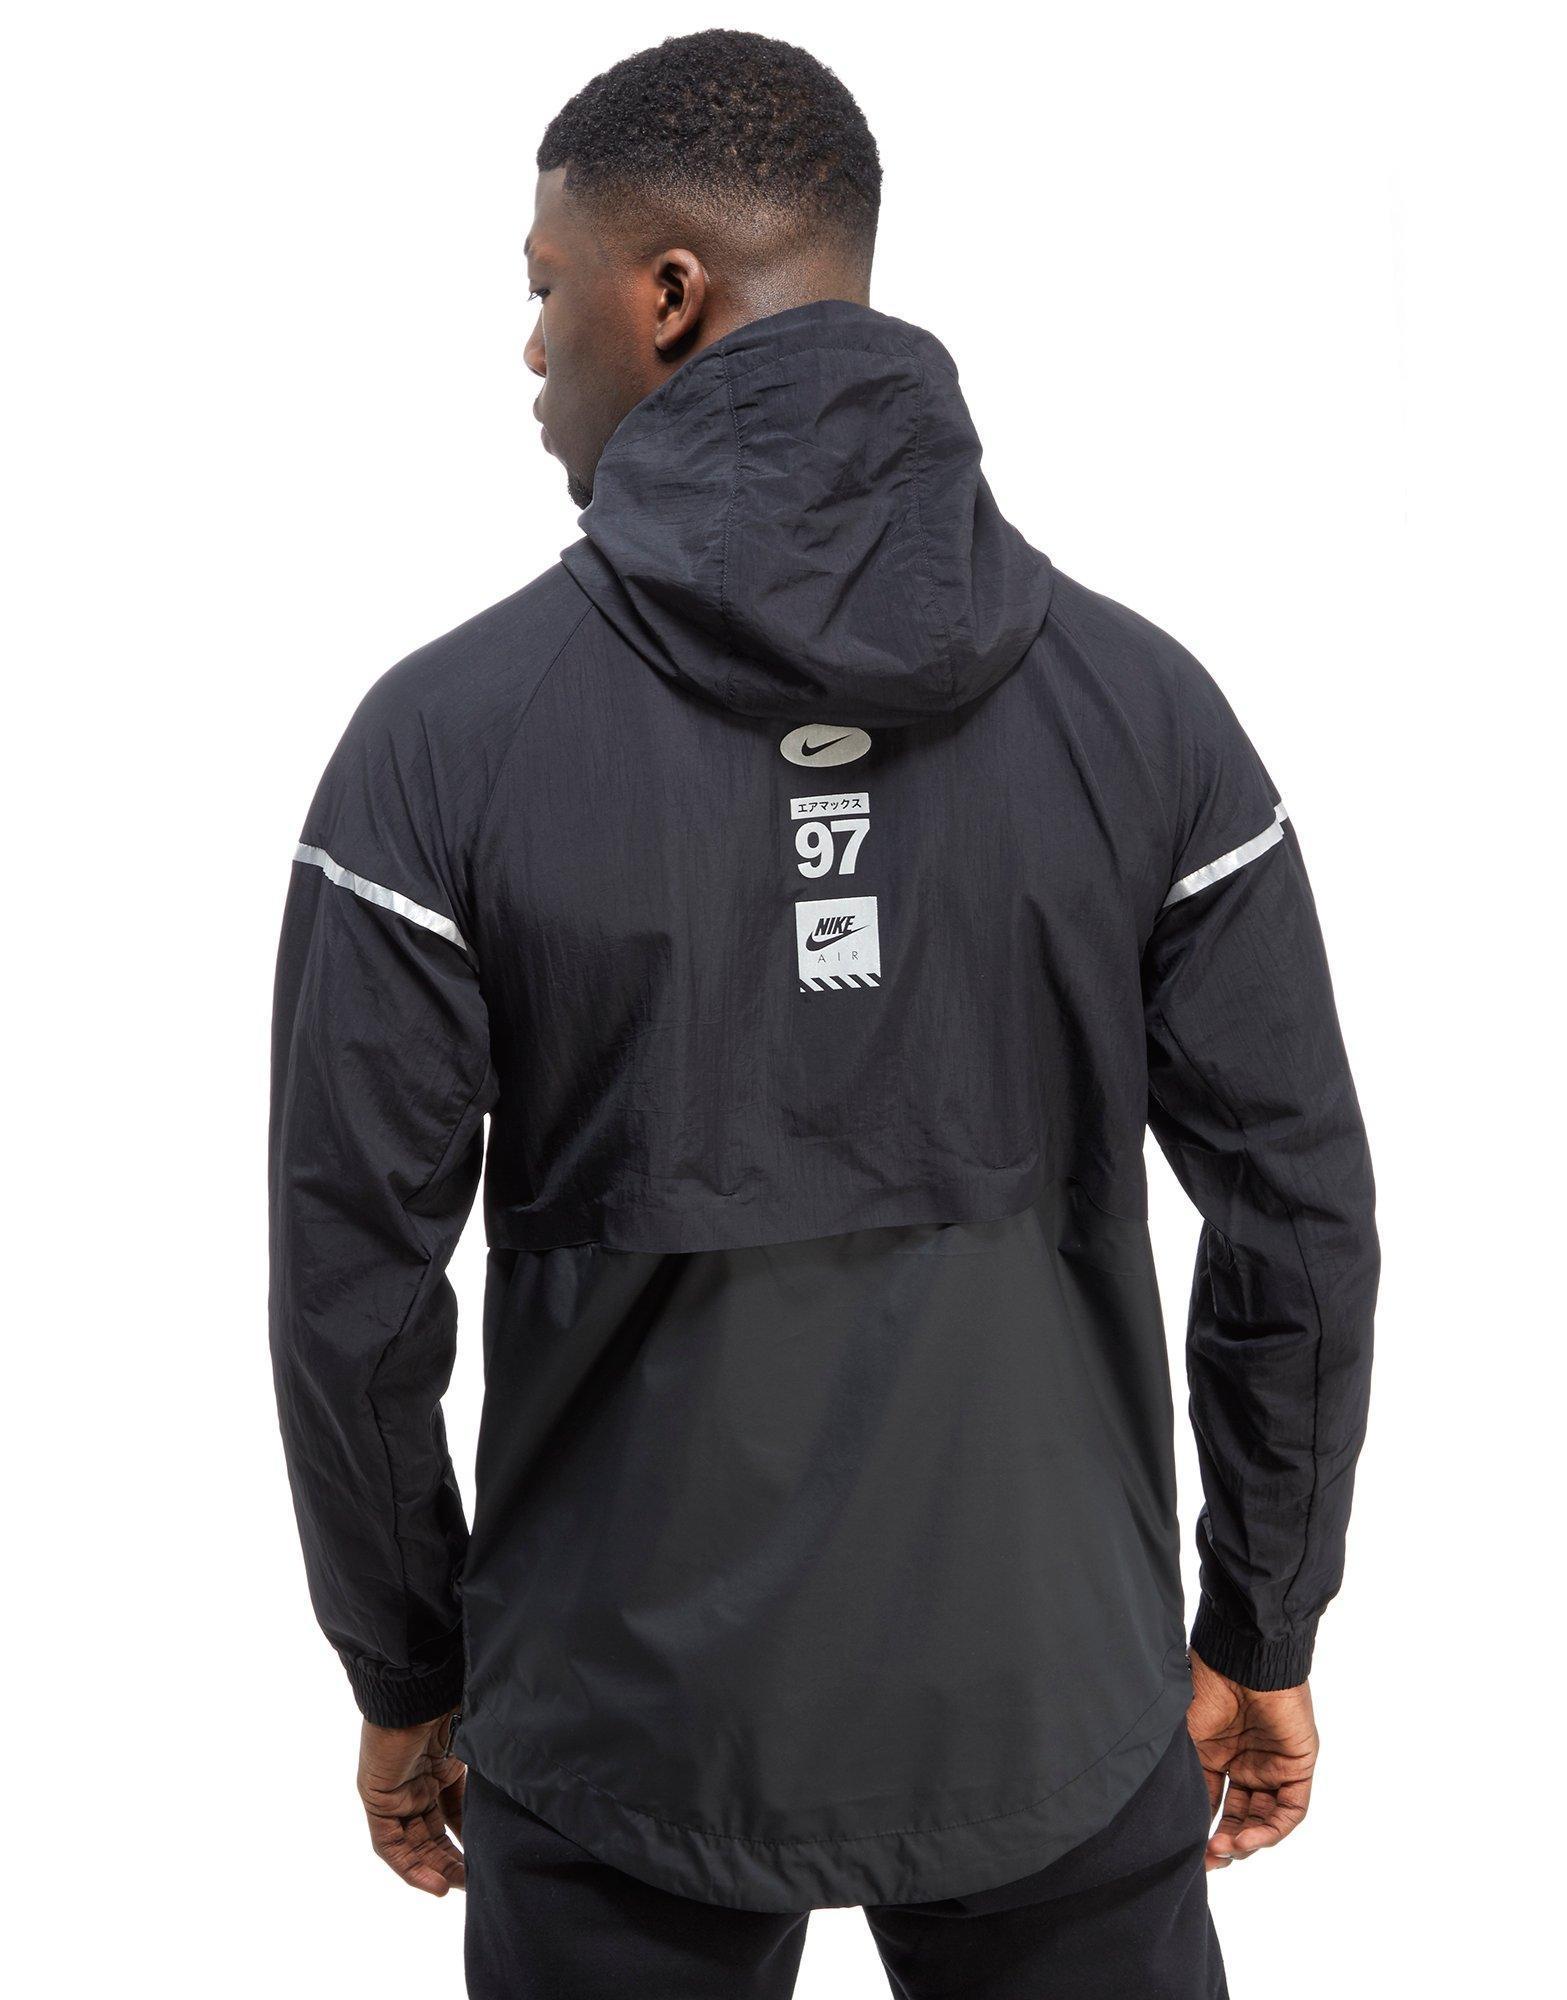 nike air hybrid 1 2 zip woven jacket in black for men lyst. Black Bedroom Furniture Sets. Home Design Ideas